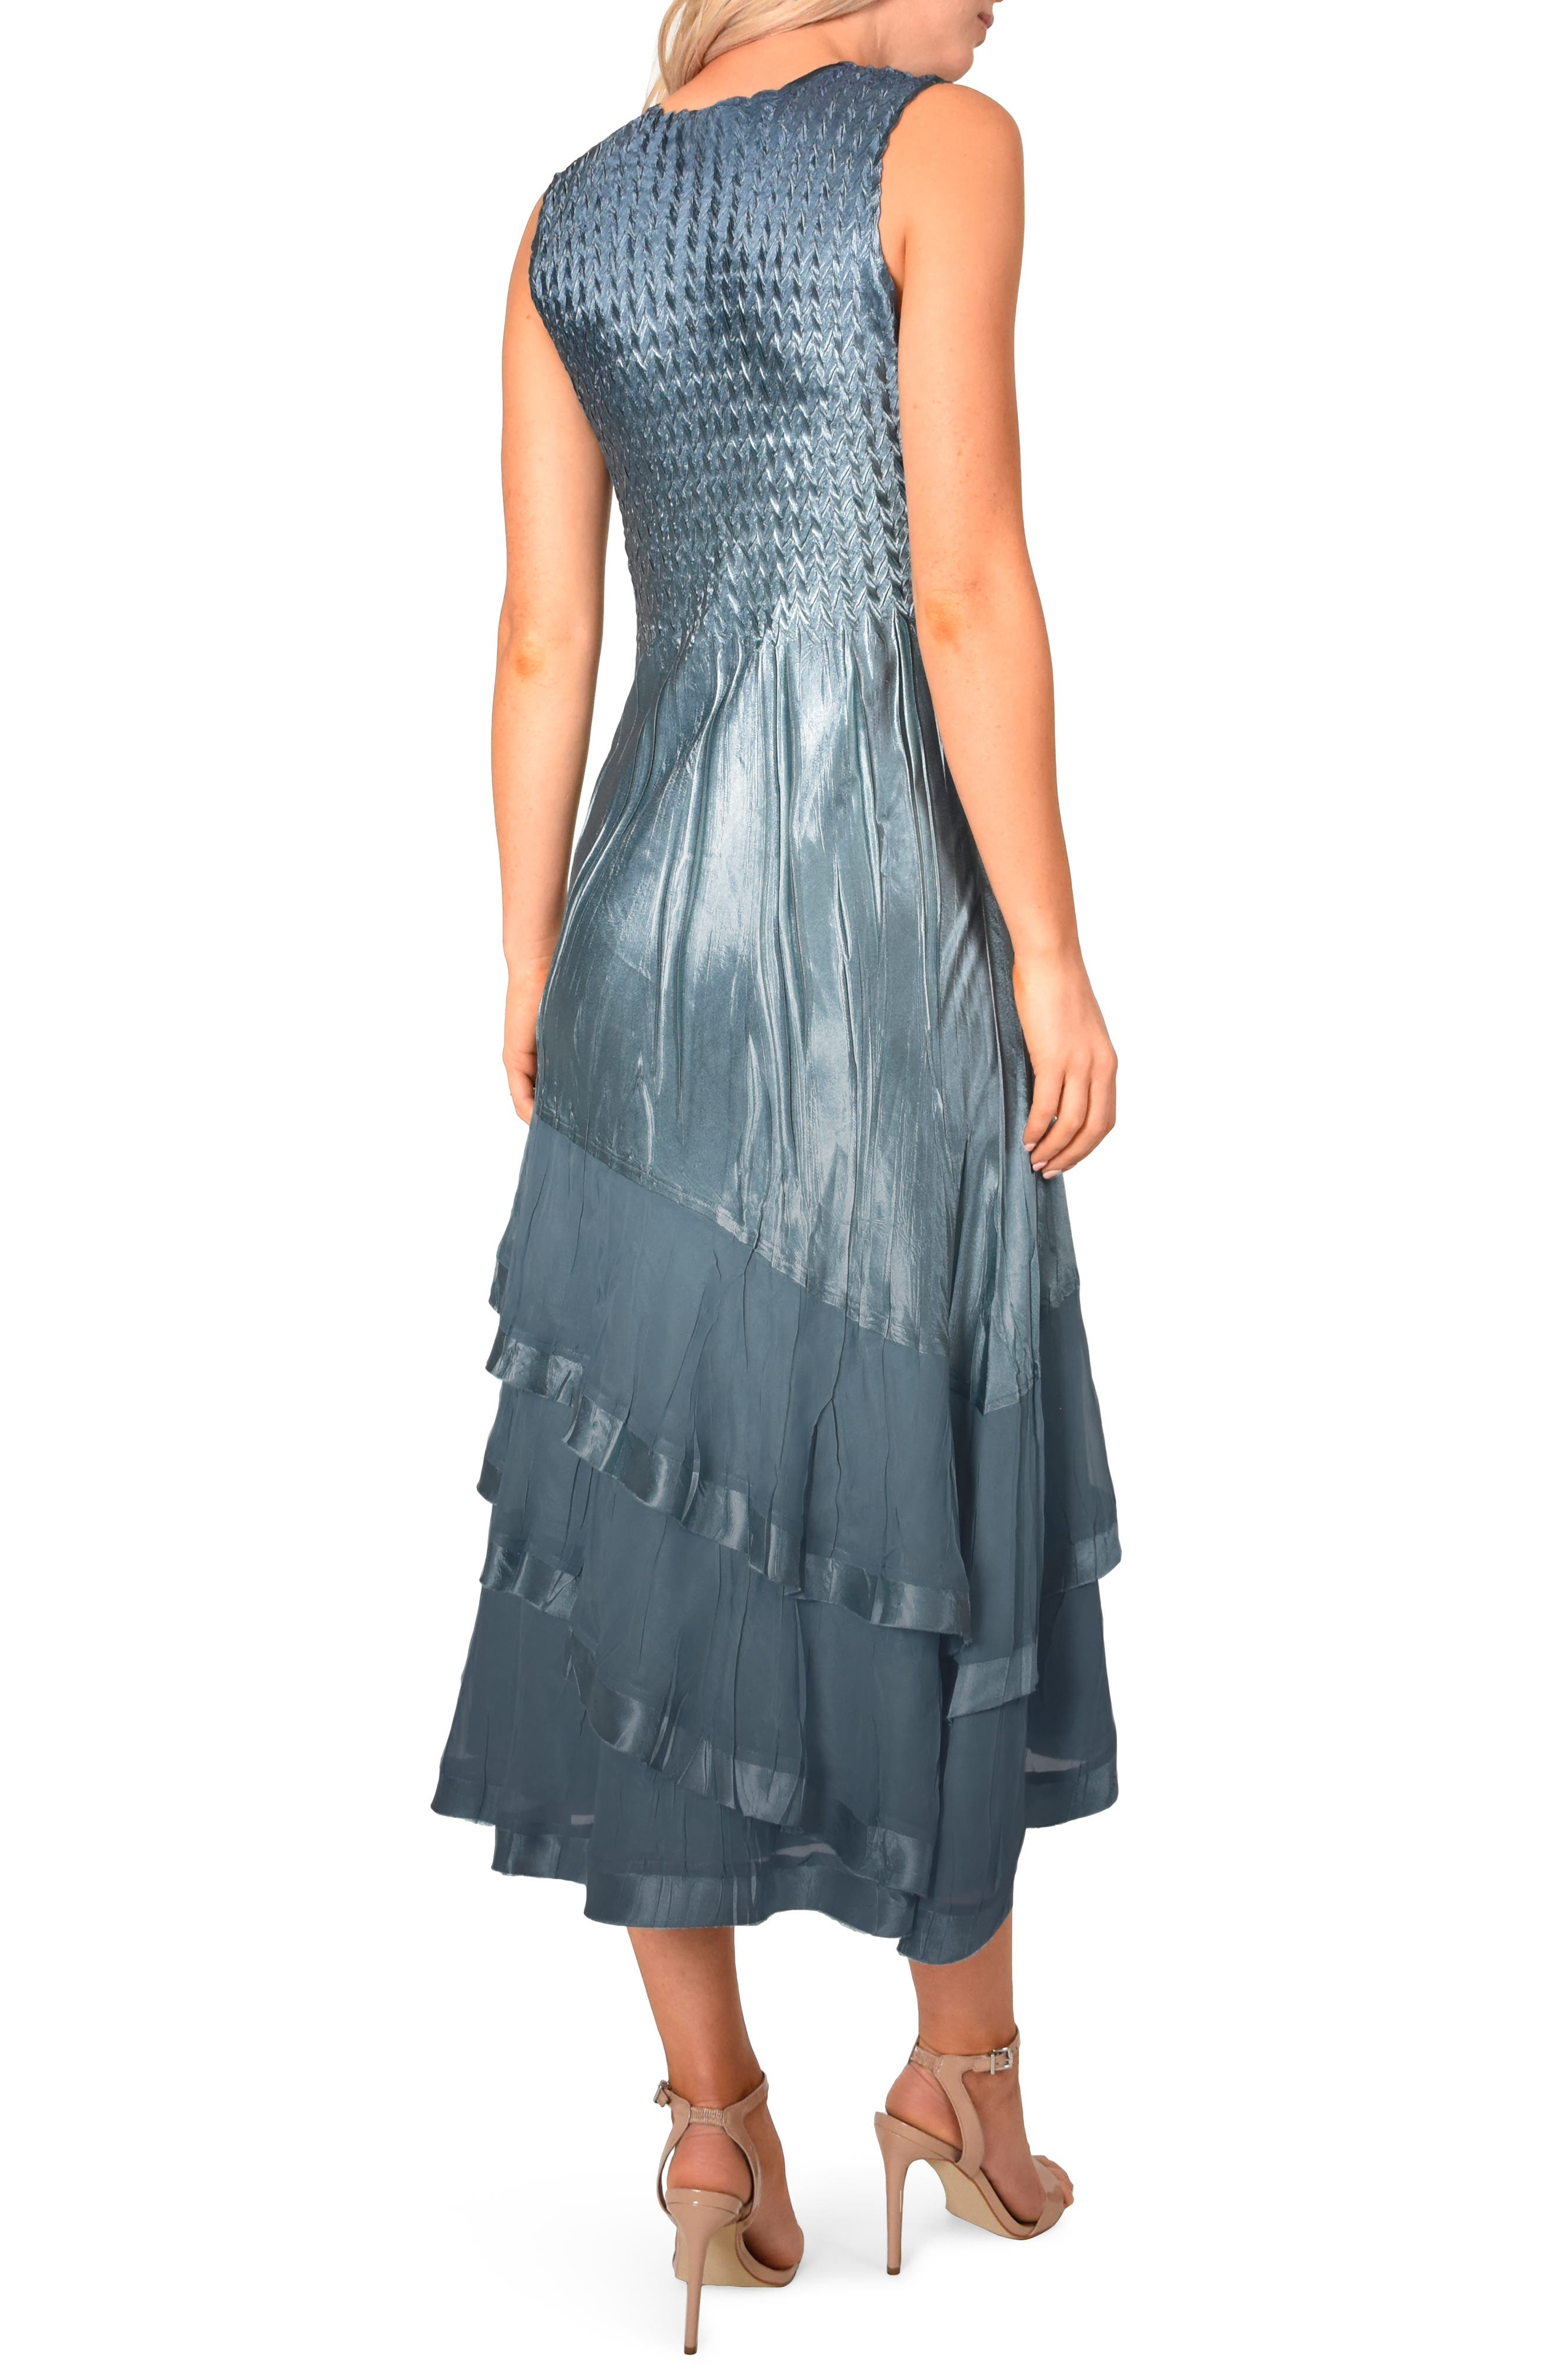 KOMAROV, Asymmetrical Jacket Dress, Alternate thumbnail 5, color, SILVER BLUE NIGHT OMBRE